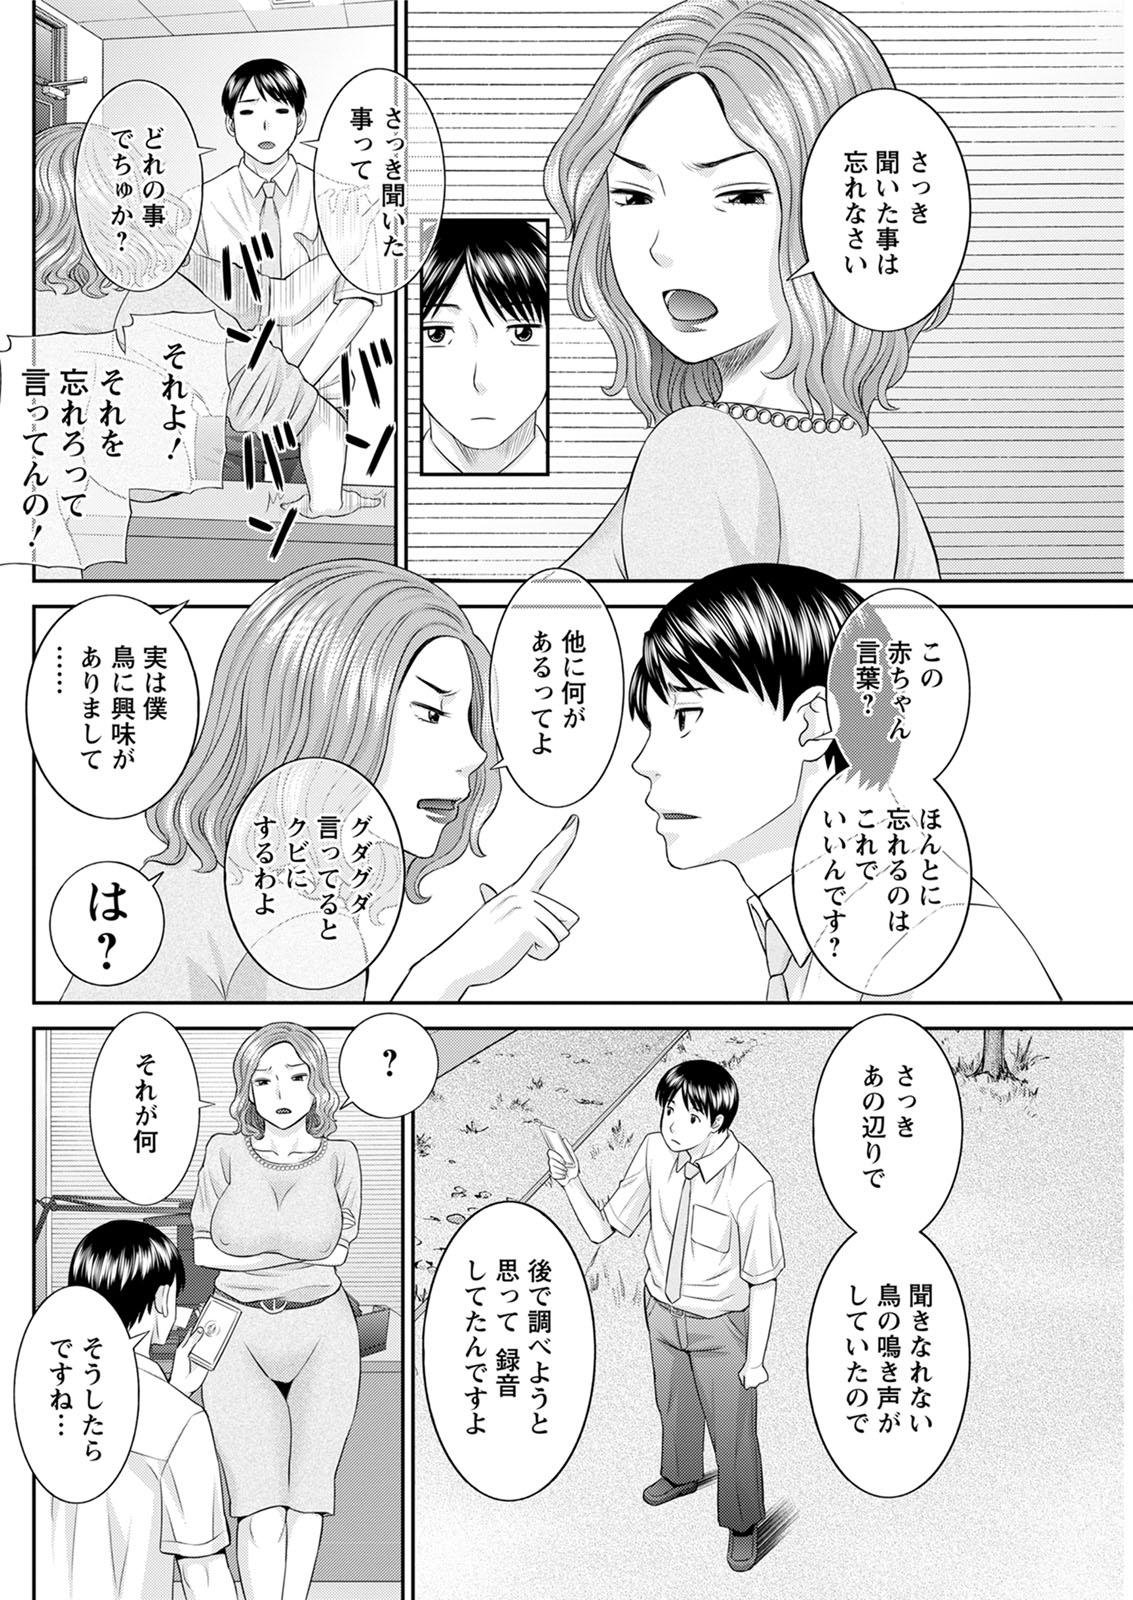 [Kawamori Misaki] Kaikan Hitotsuma Gakuen Ch. 1-6, 8-16 [Digital] 226